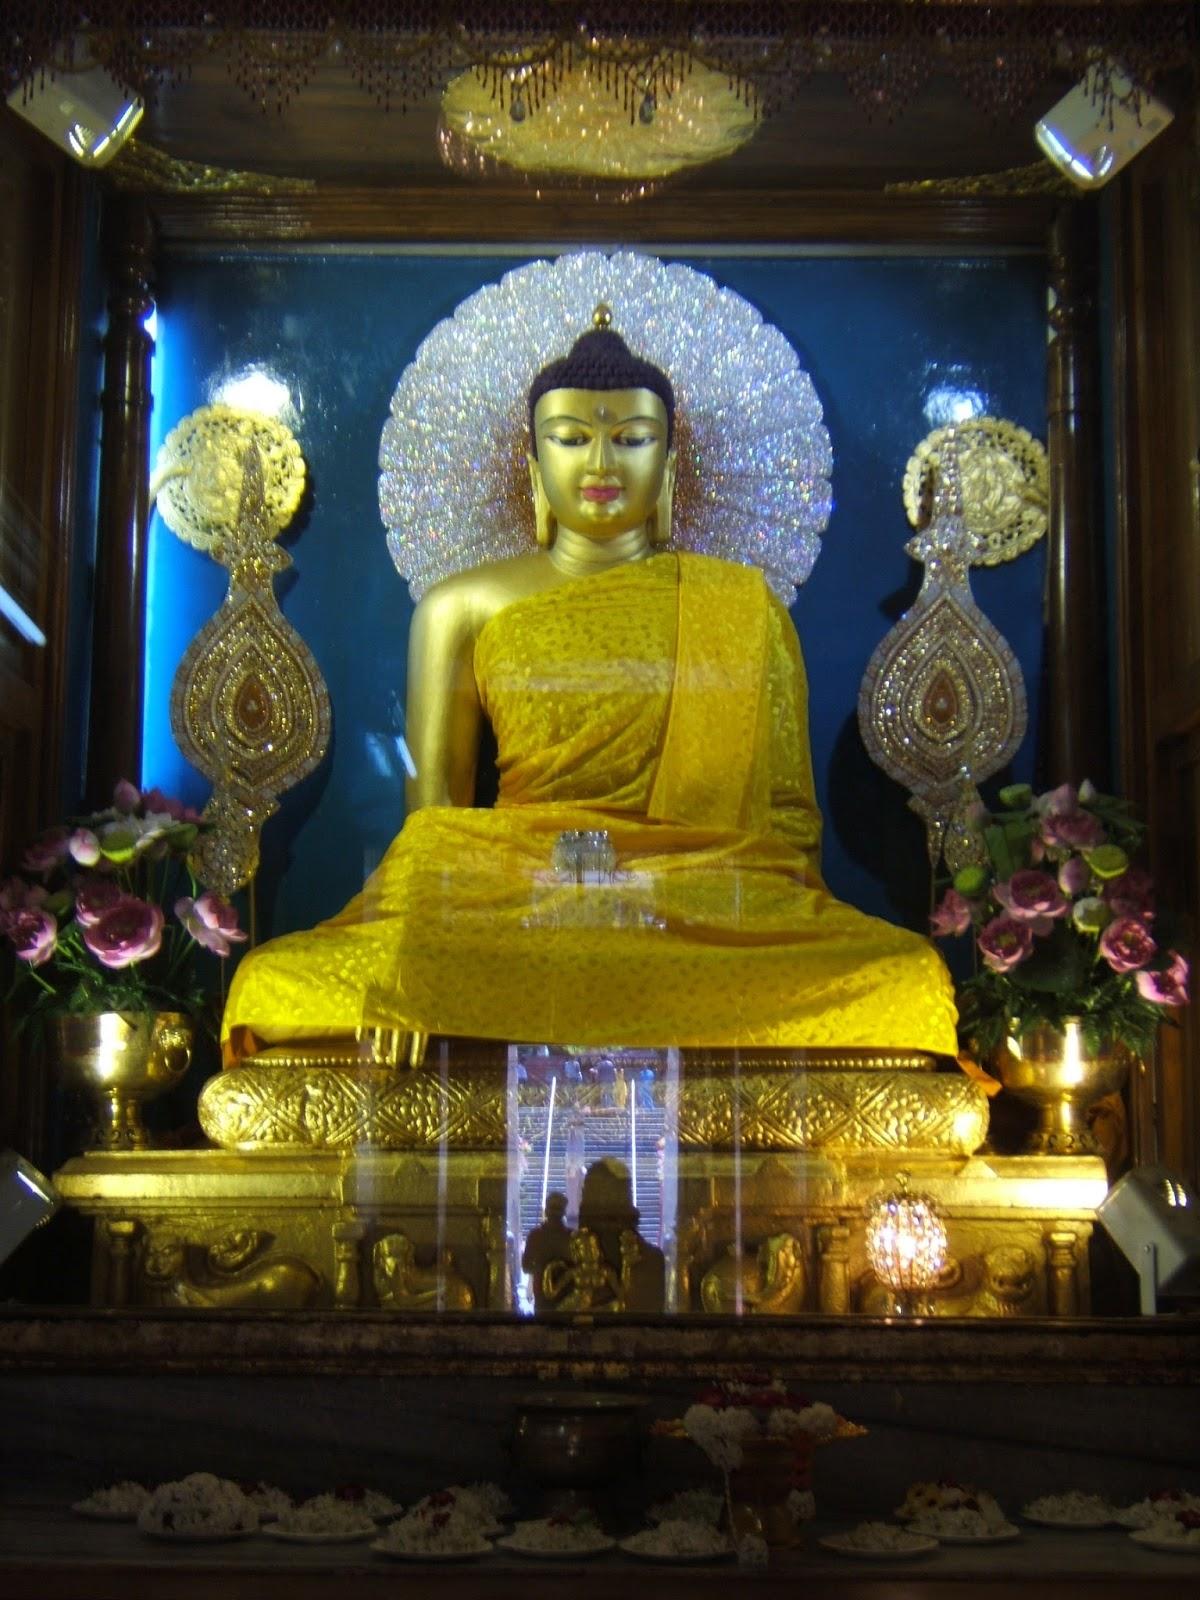 Good Morning with Lord Buddha